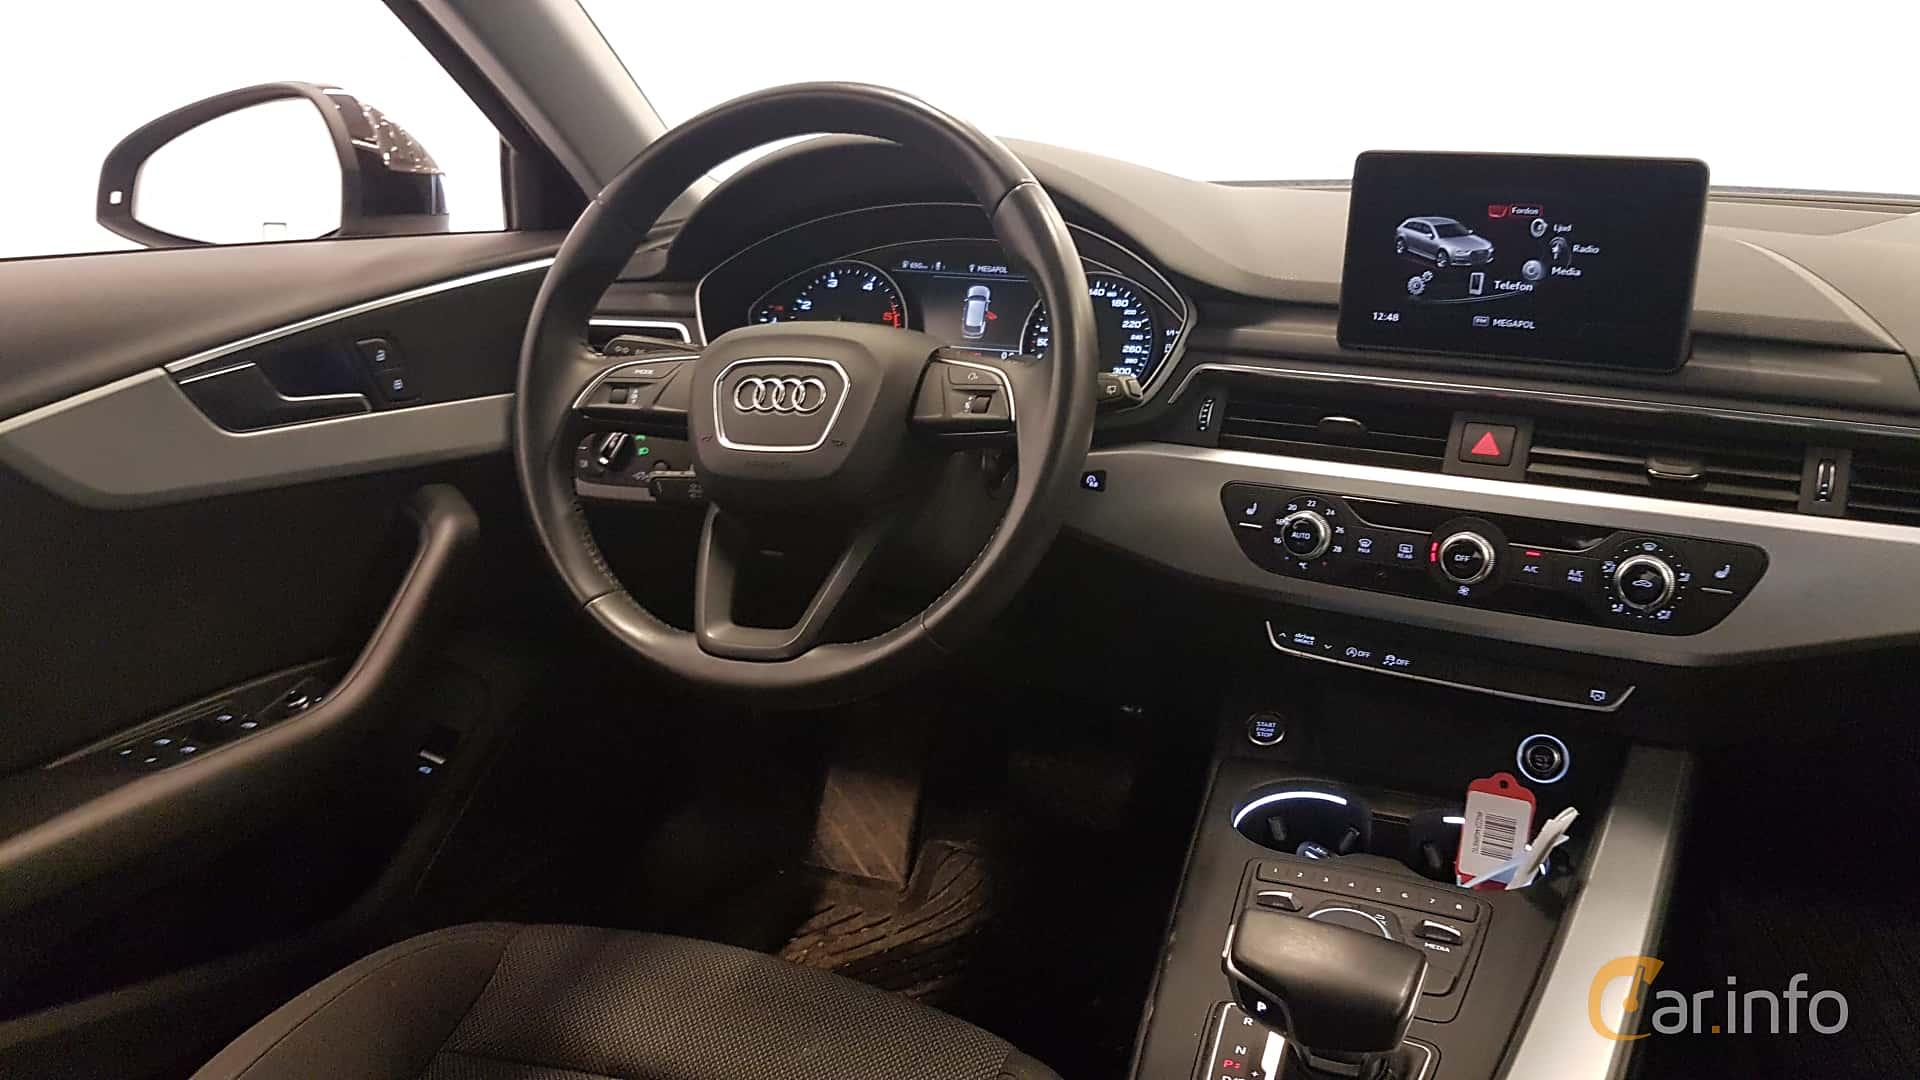 Audi A4 Avant 2.0 TDI quattro S Tronic, 190hp, 2016